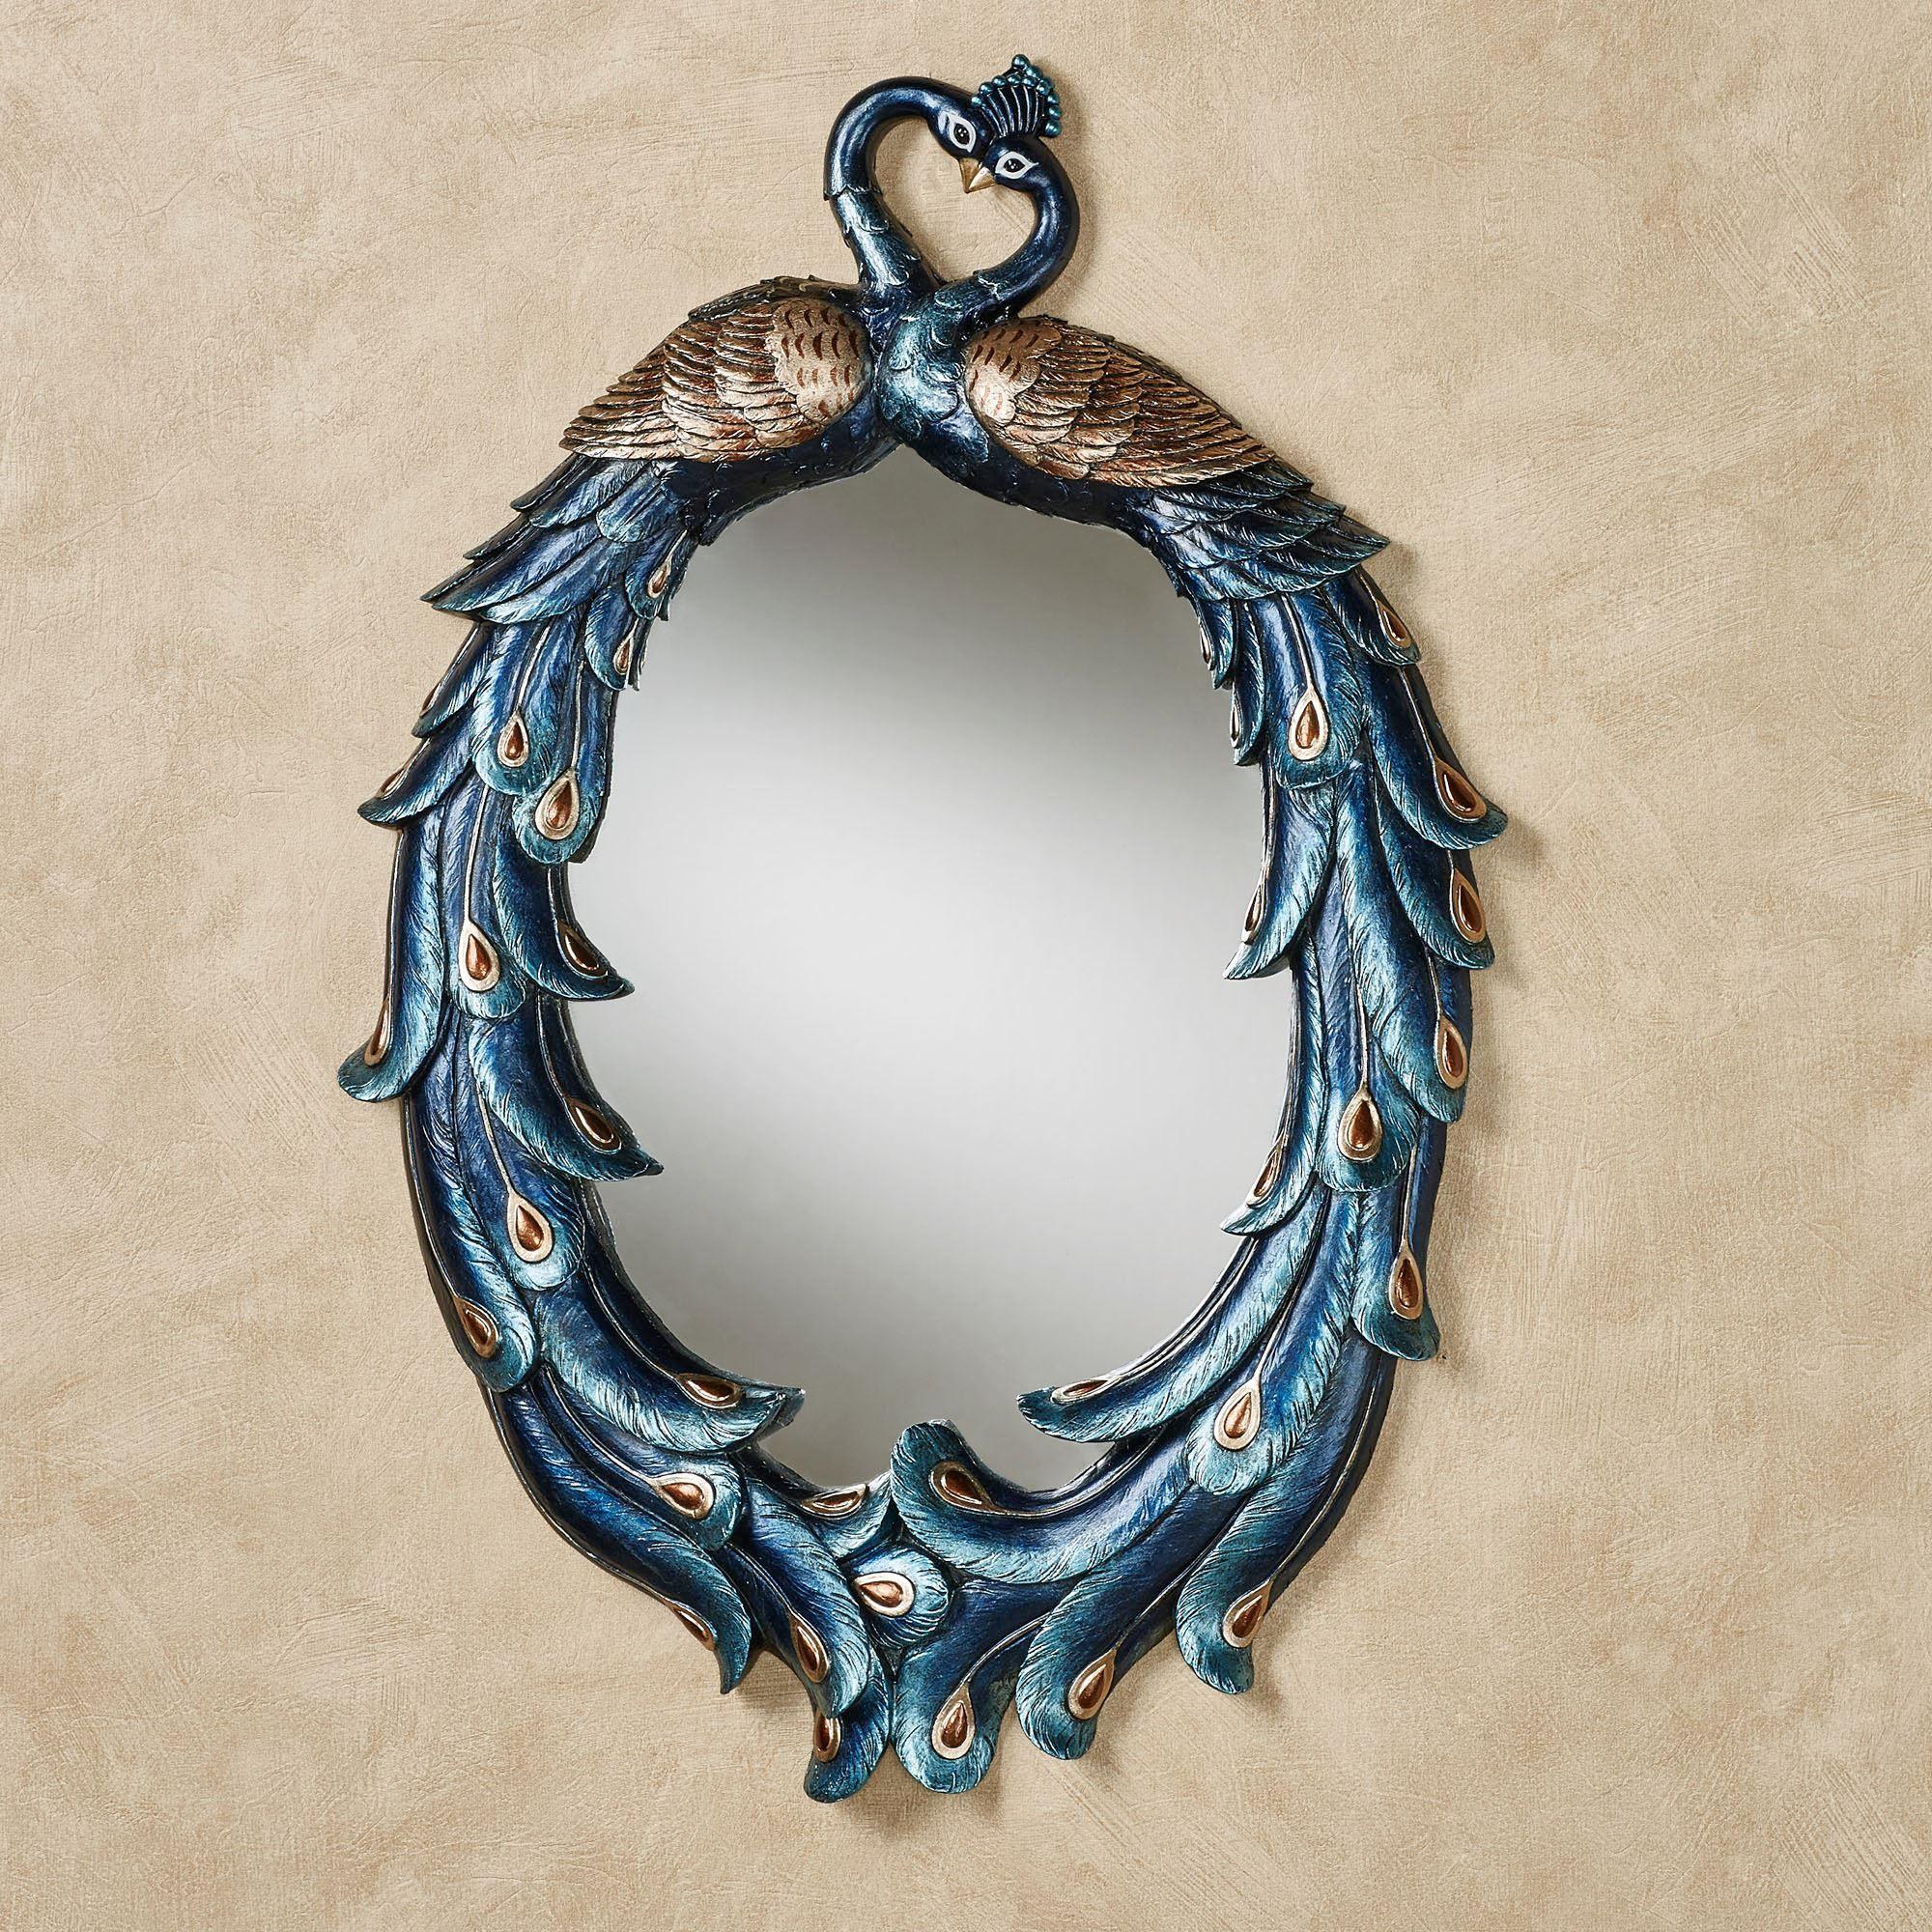 Priscilla peacocks blue oval wall mirror peacock blue and peacocks